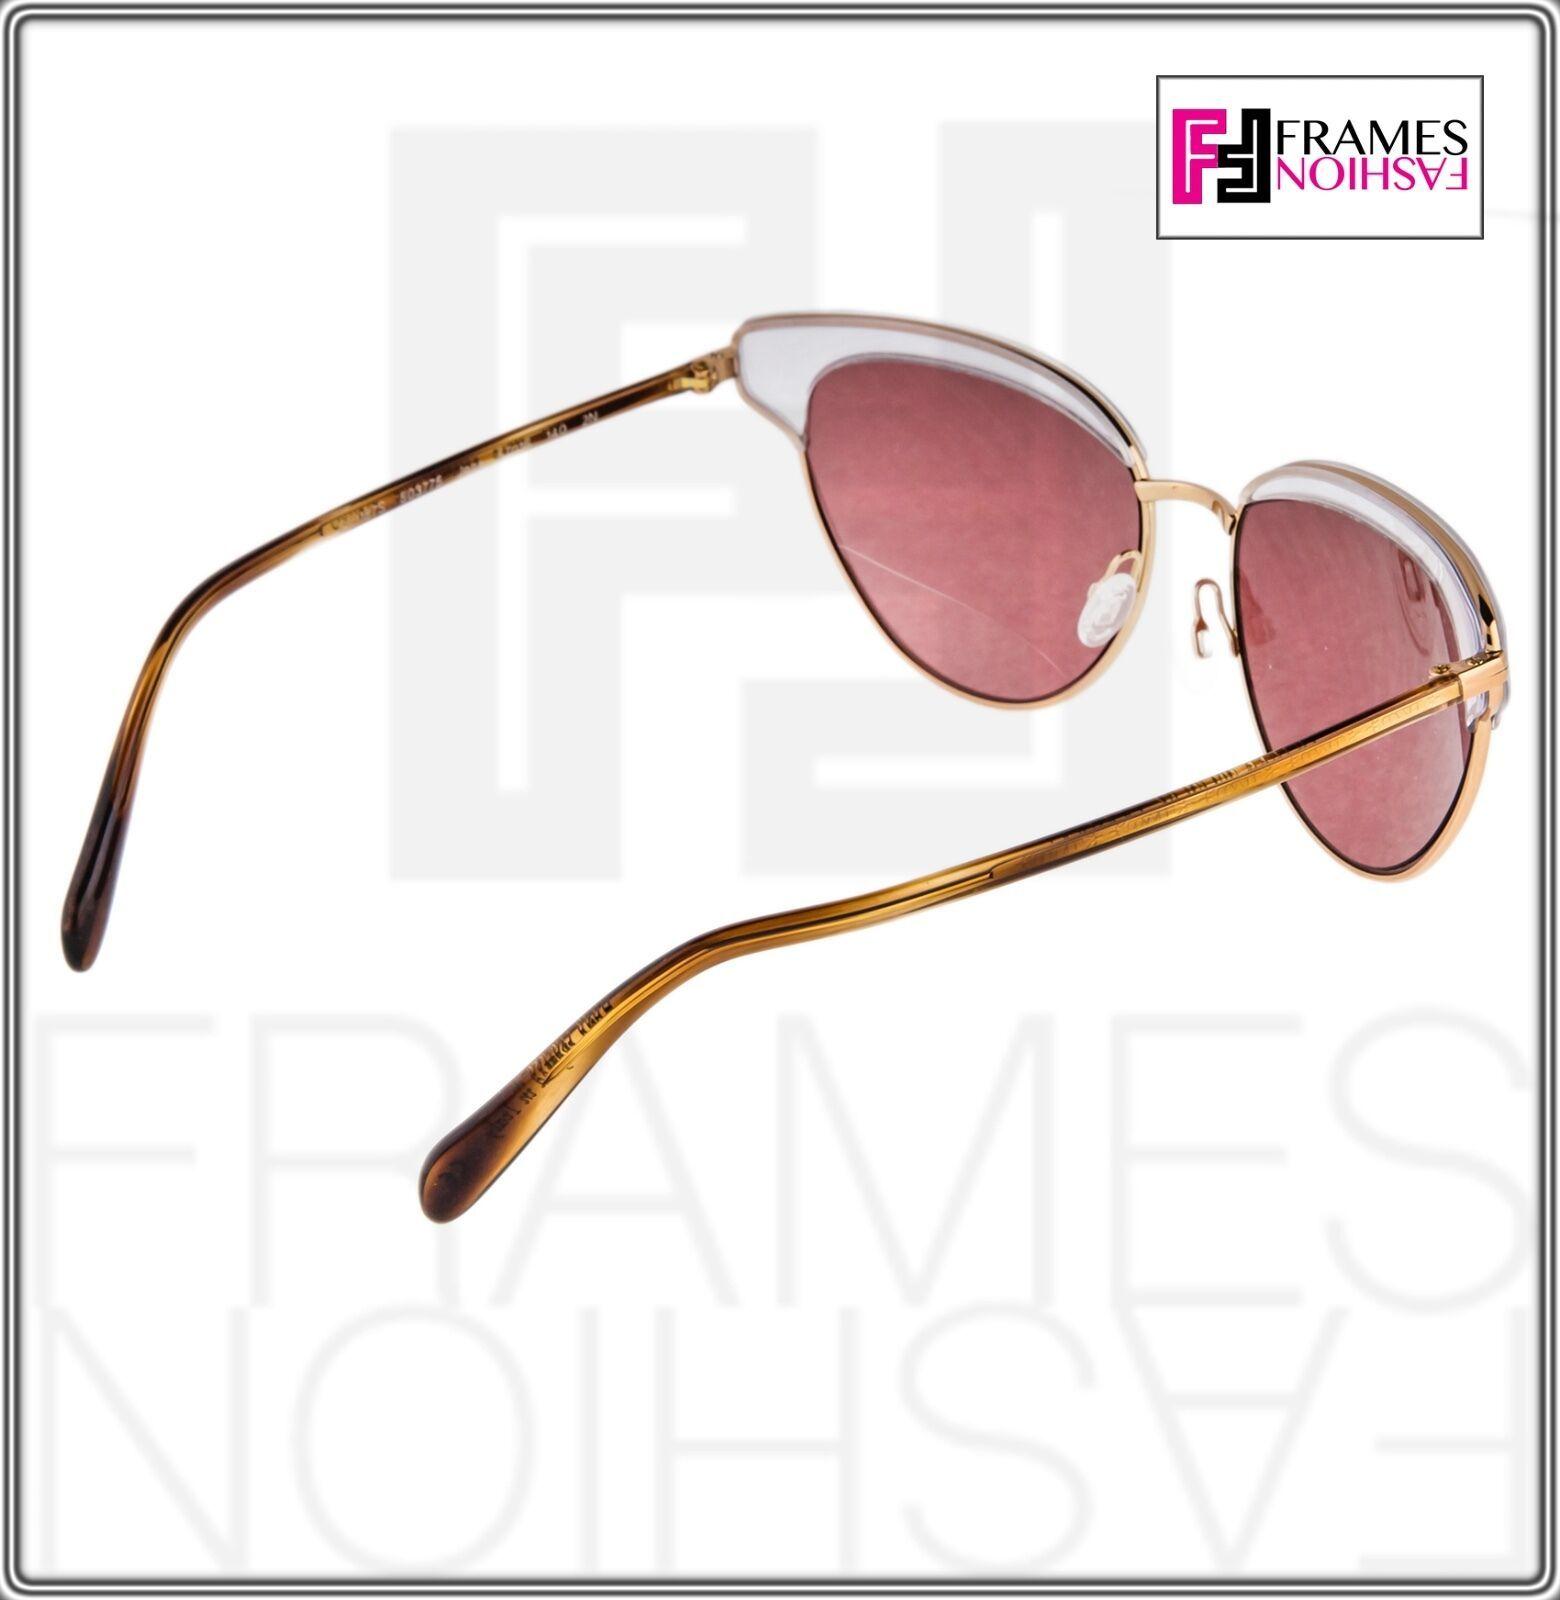 OLIVER PEOPLES JOSA OV1187S Rose Gold Pink Crystal Cat Eye Sunglasses 1187 image 6